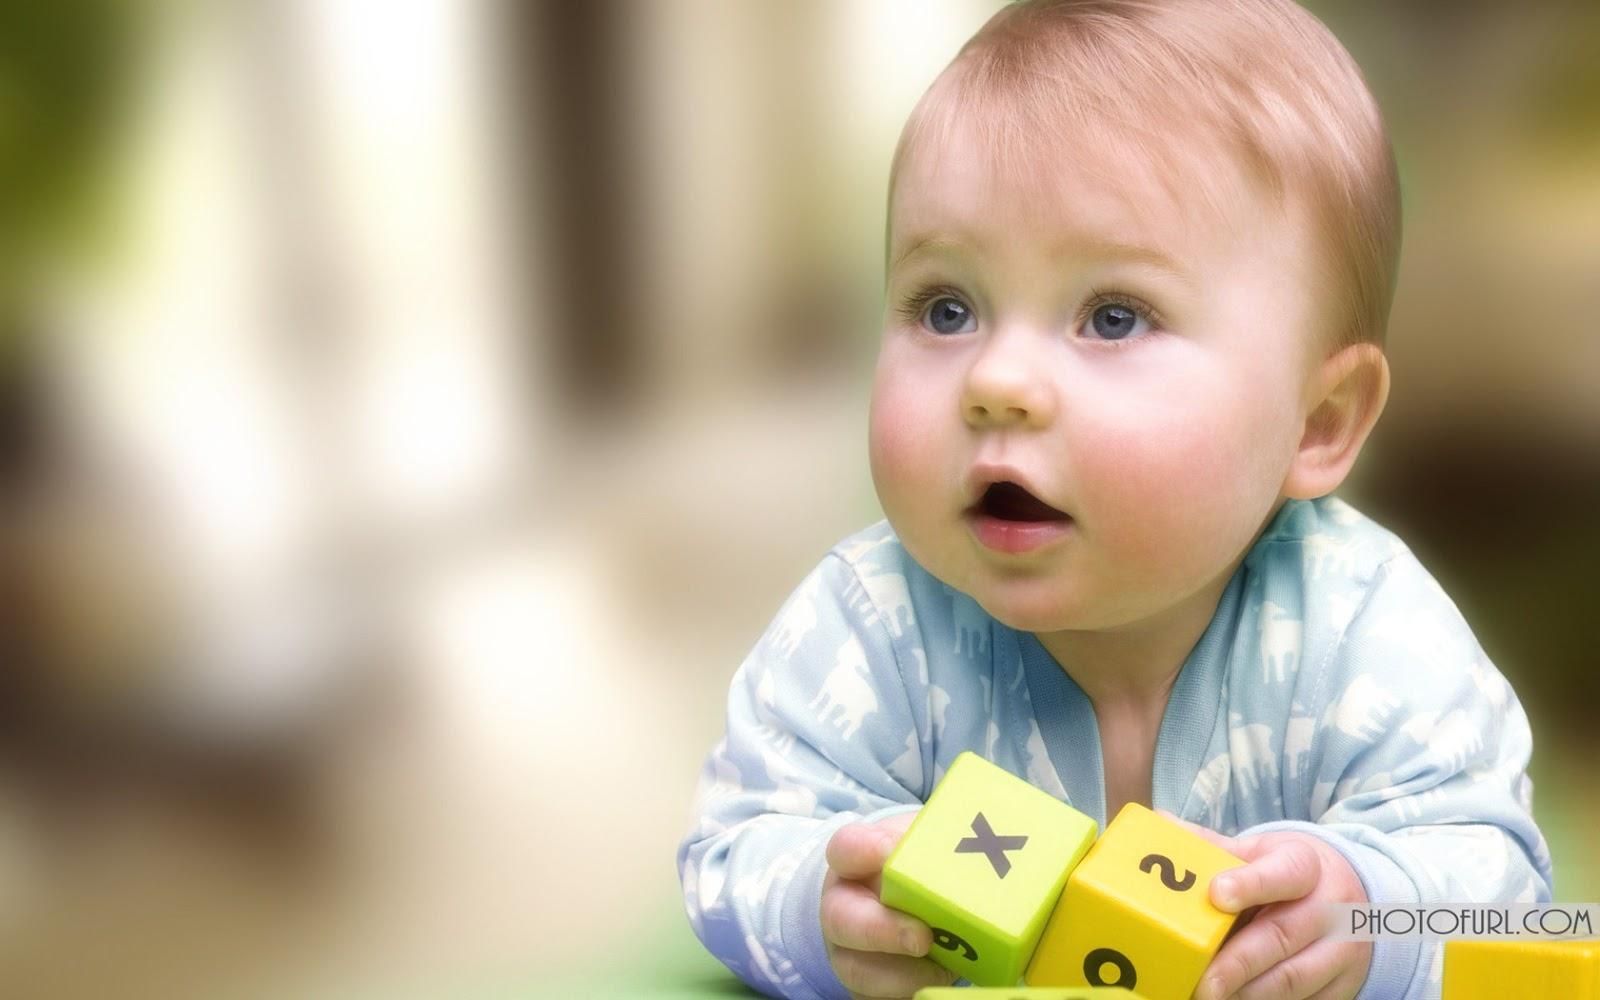 https://4.bp.blogspot.com/-fGSNzfEsiCI/UTBglOL05aI/AAAAAAAAJQU/h2YGYGzpHSQ/s1600/Blue+Eyes+Cute+Baby+Boy+With+His+Toys+HD+Wallpaper-1680x1050-cutelittlebabies.blog .jpg